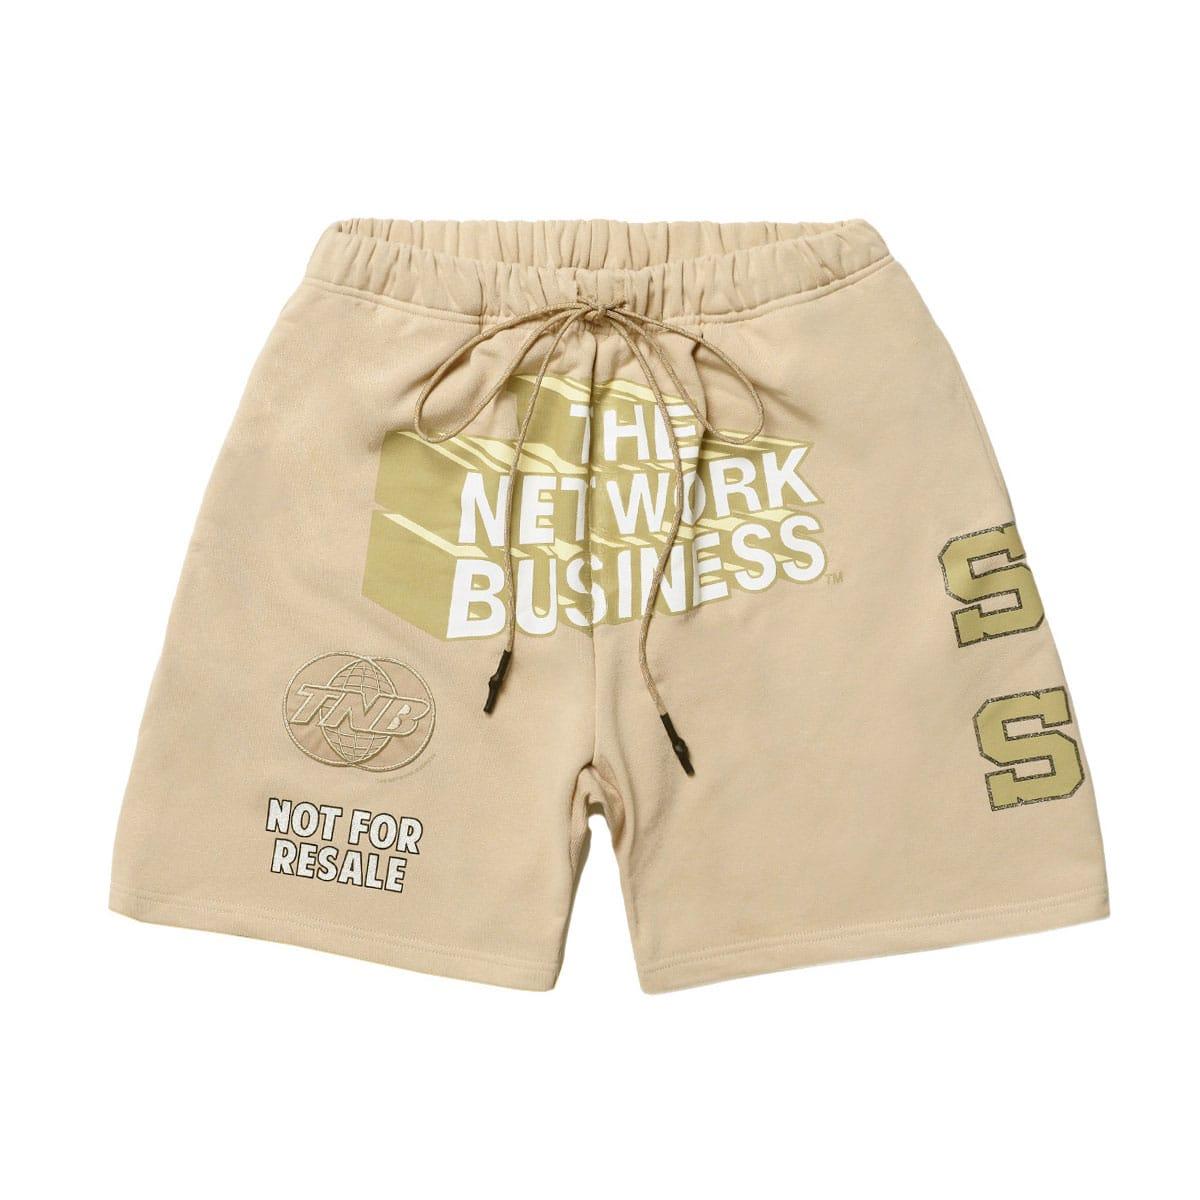 THE NETWORK BUSINESS Sweat Short Pants ベージュ 21SP-I_photo_large